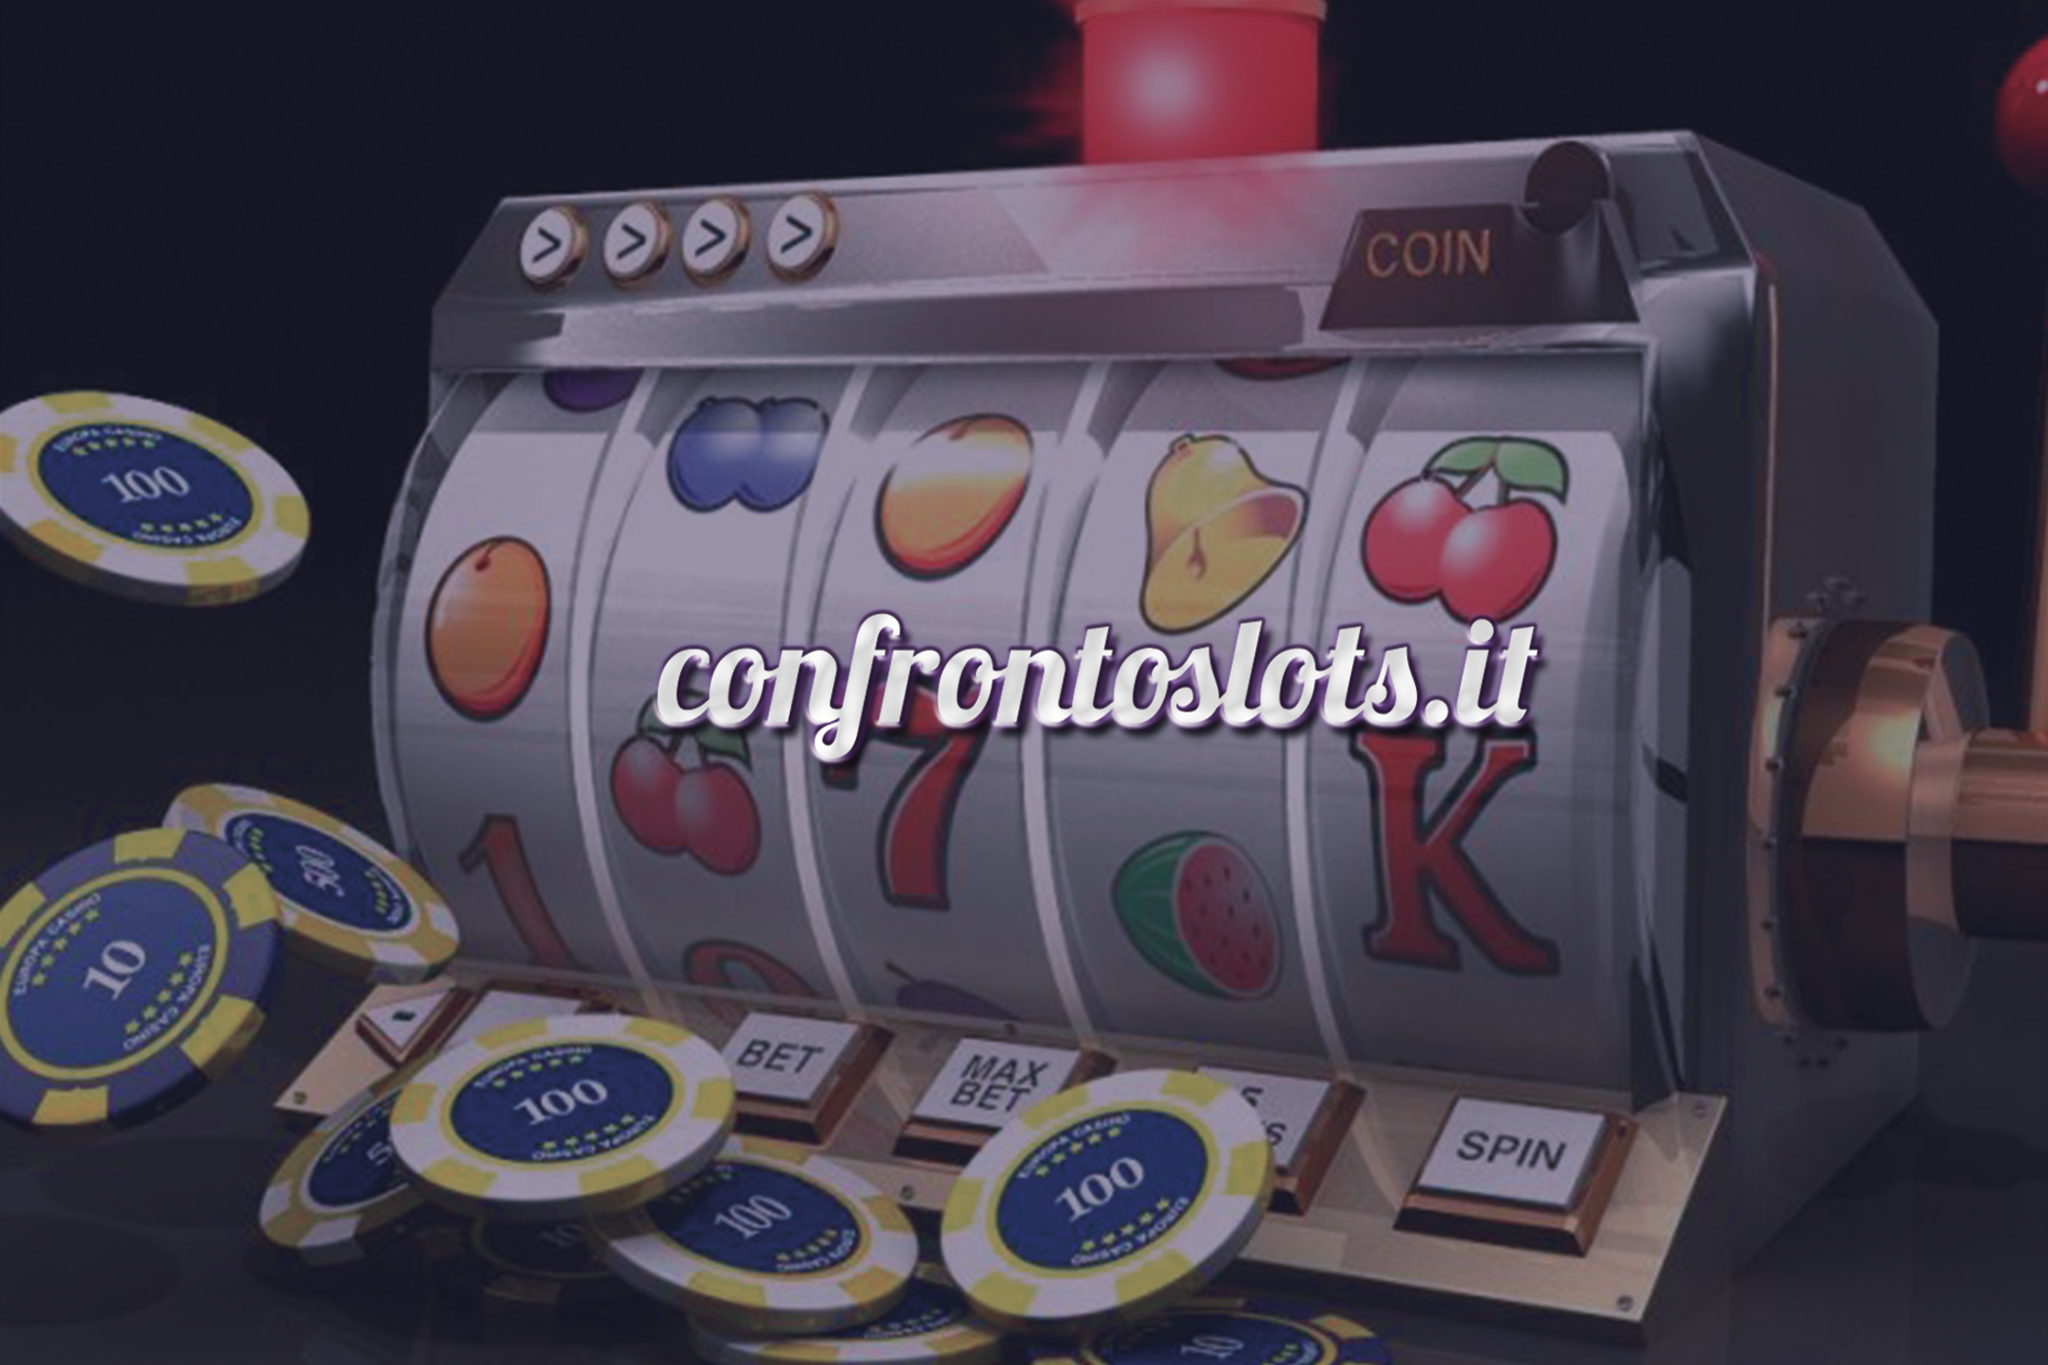 ConfrontoSlots.it